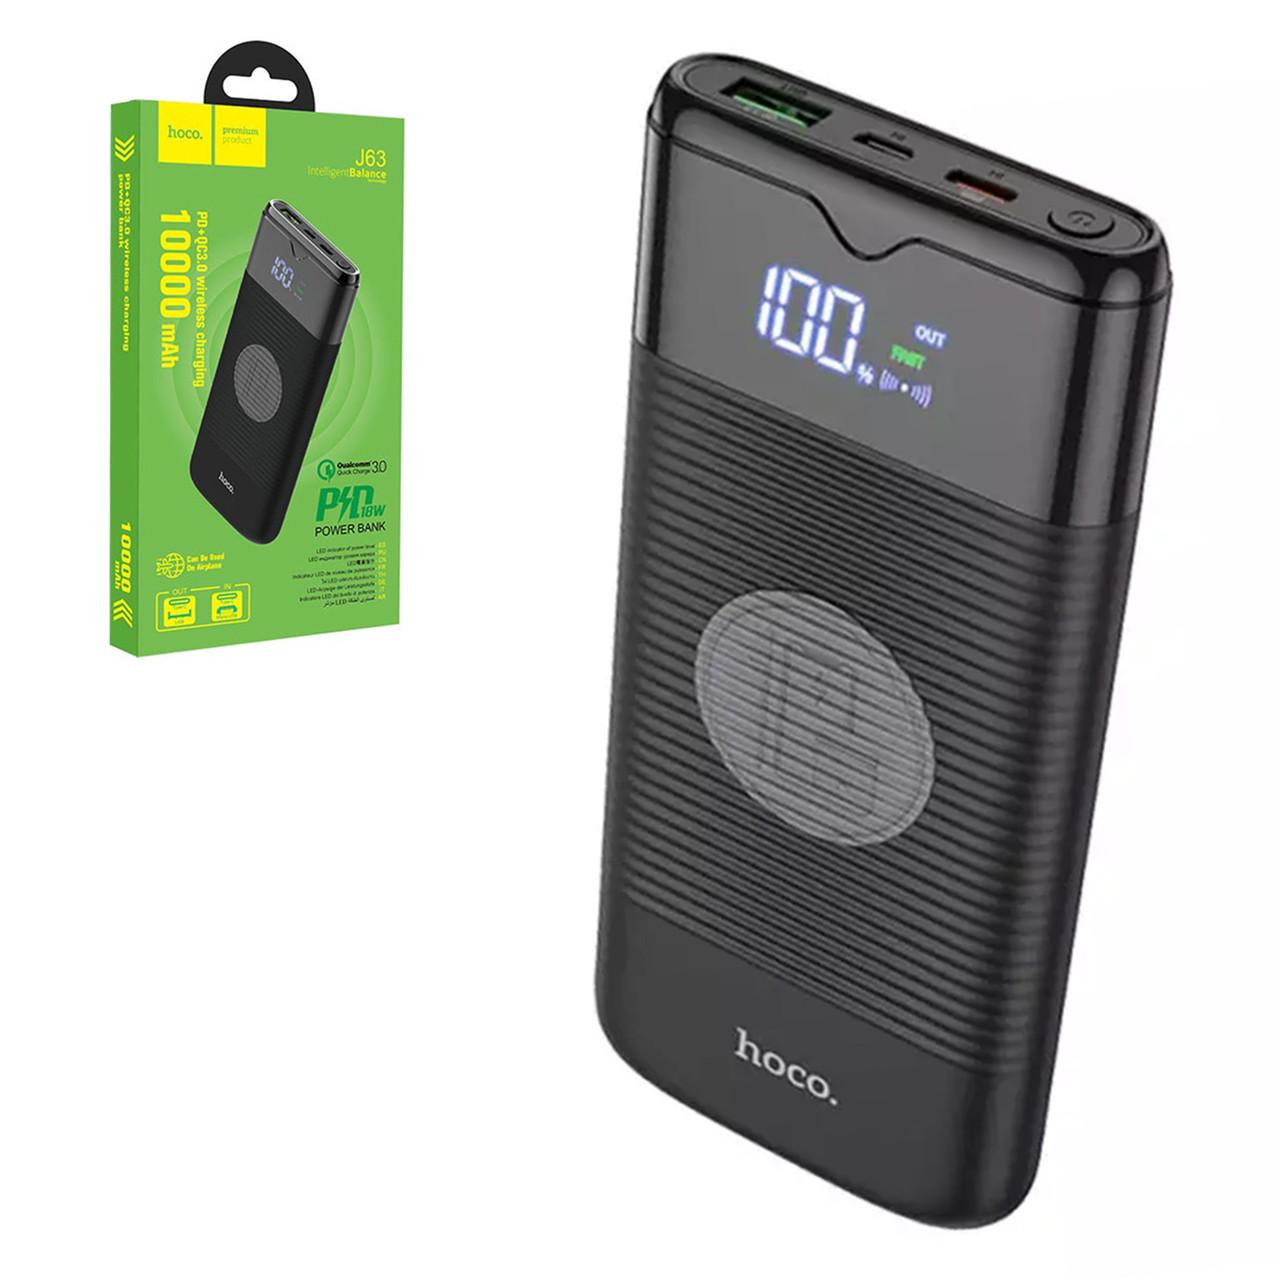 Power bank Hoco J63 Wireless 10000mAh 2XUSB PD 18W QC 3.0, Black